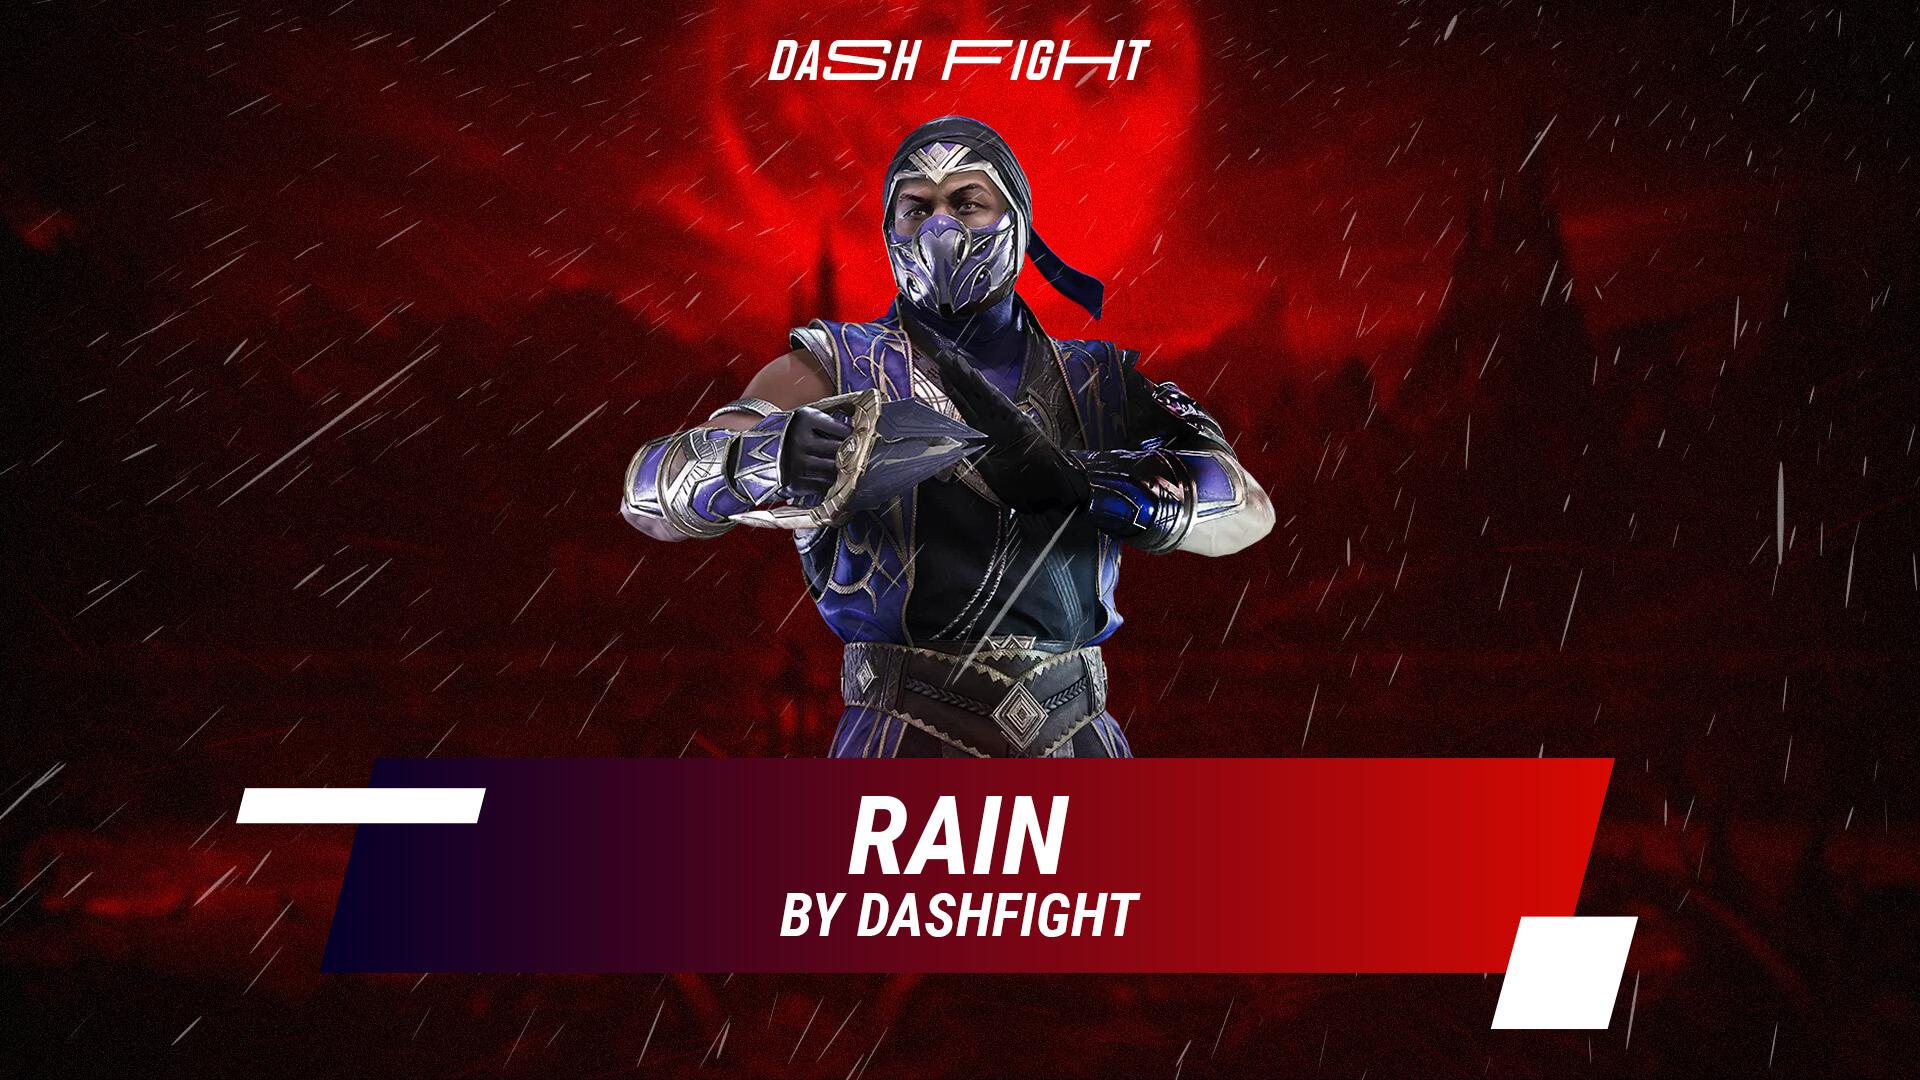 Mortal Kombat 11 Rain Move List, Fatality and Brutality